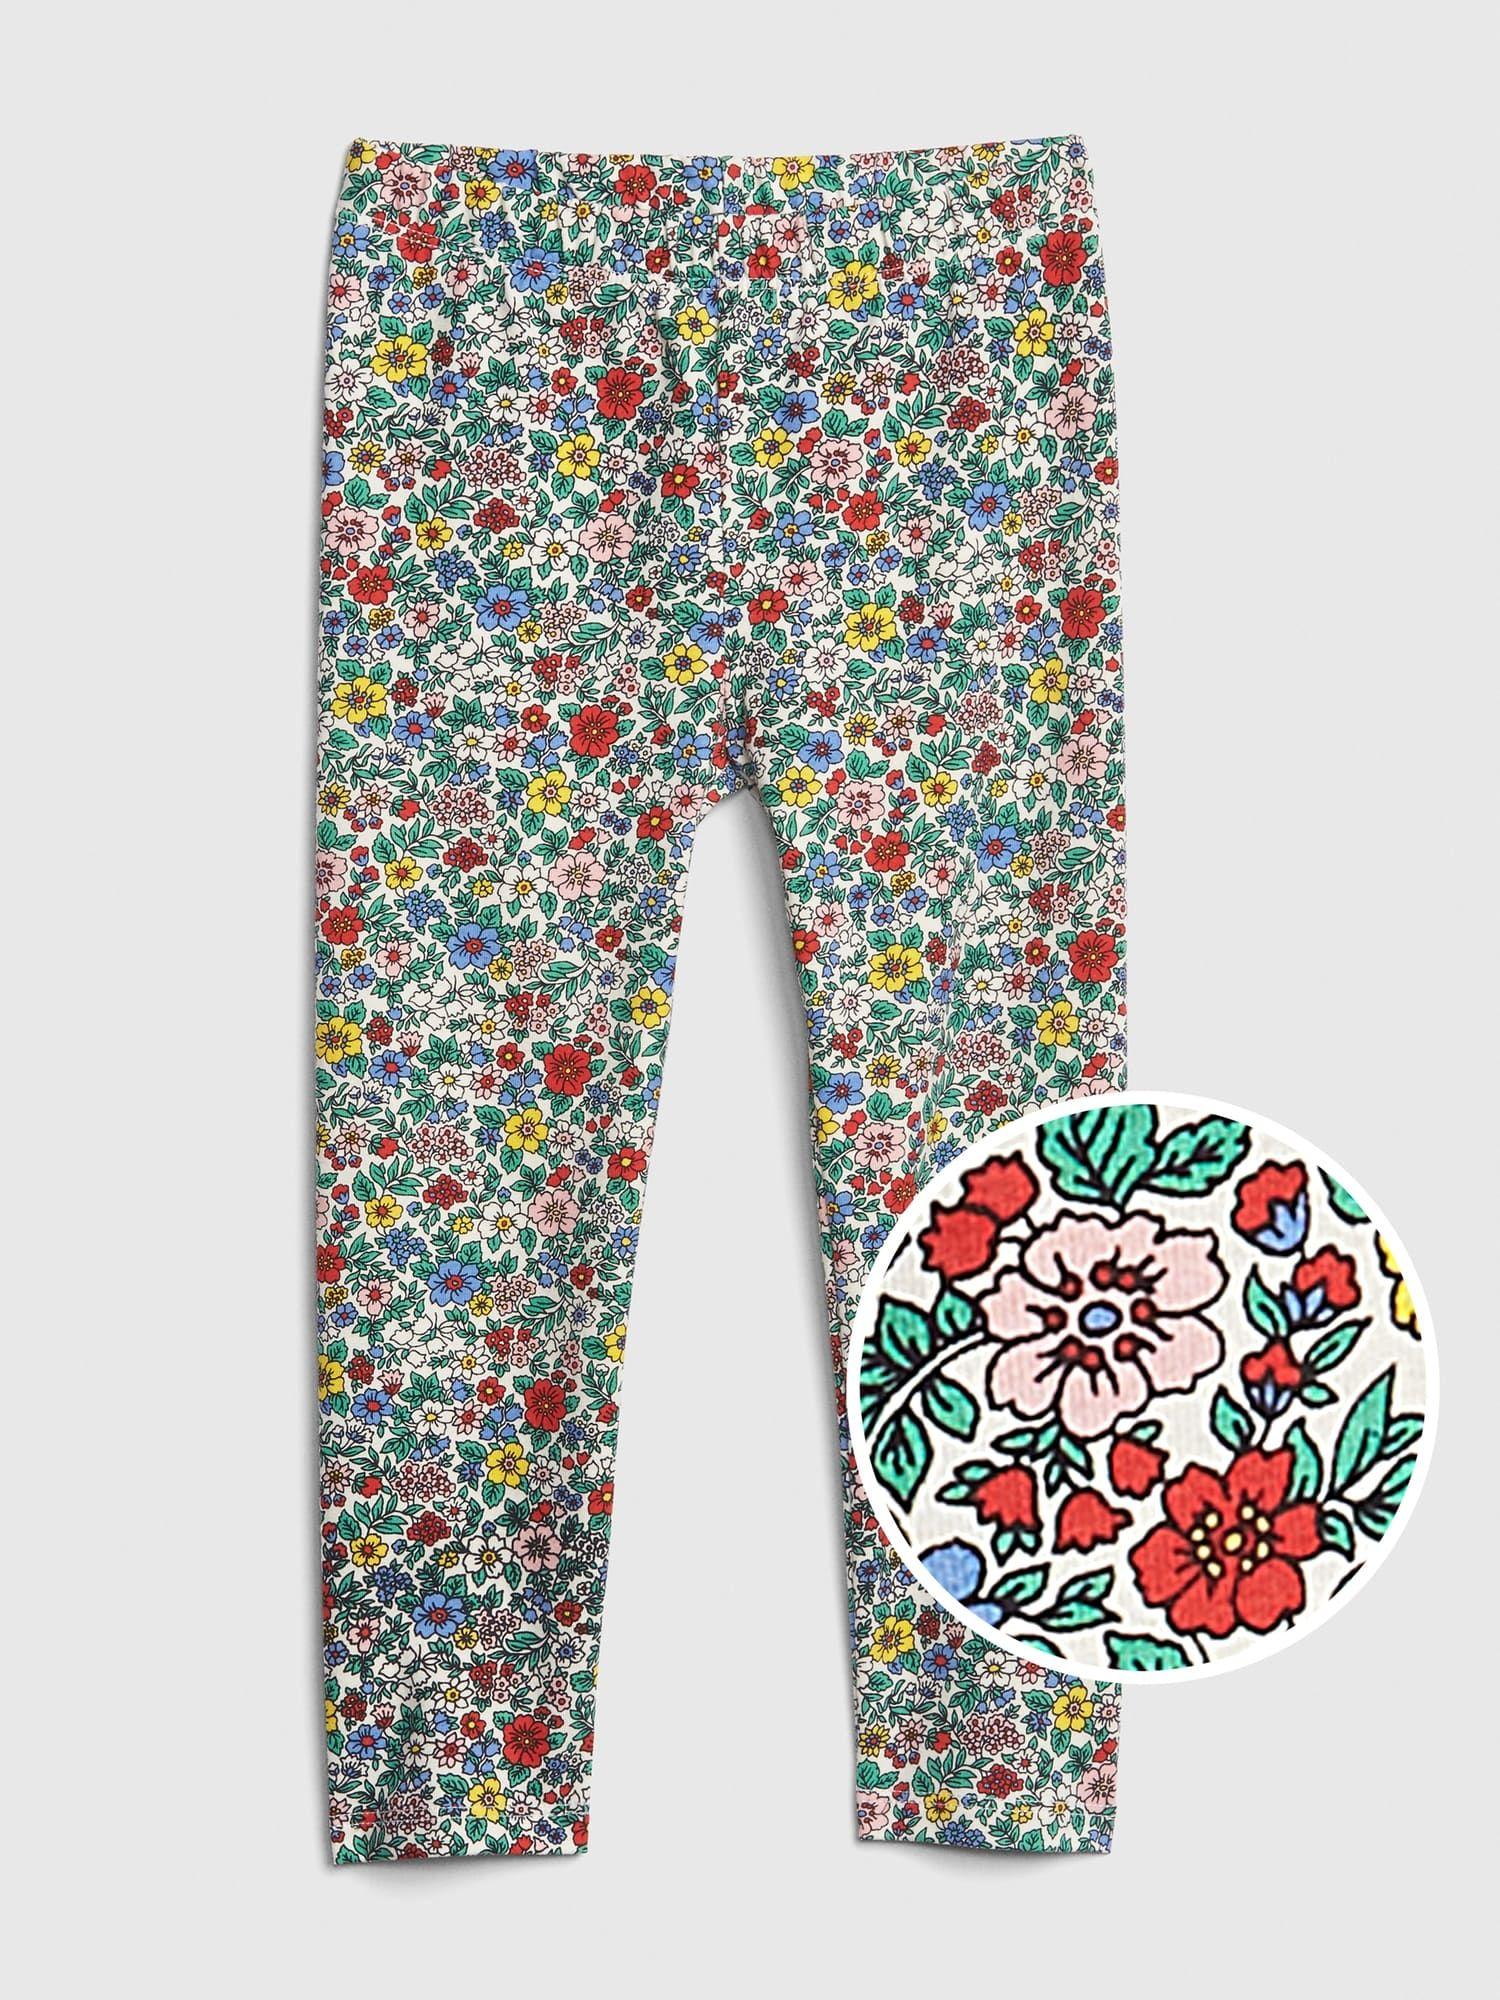 1c2f84bb1db34 product Gap Kids, Baby Prints, Pajama Pants, Girl Outfits, Printed Leggings,